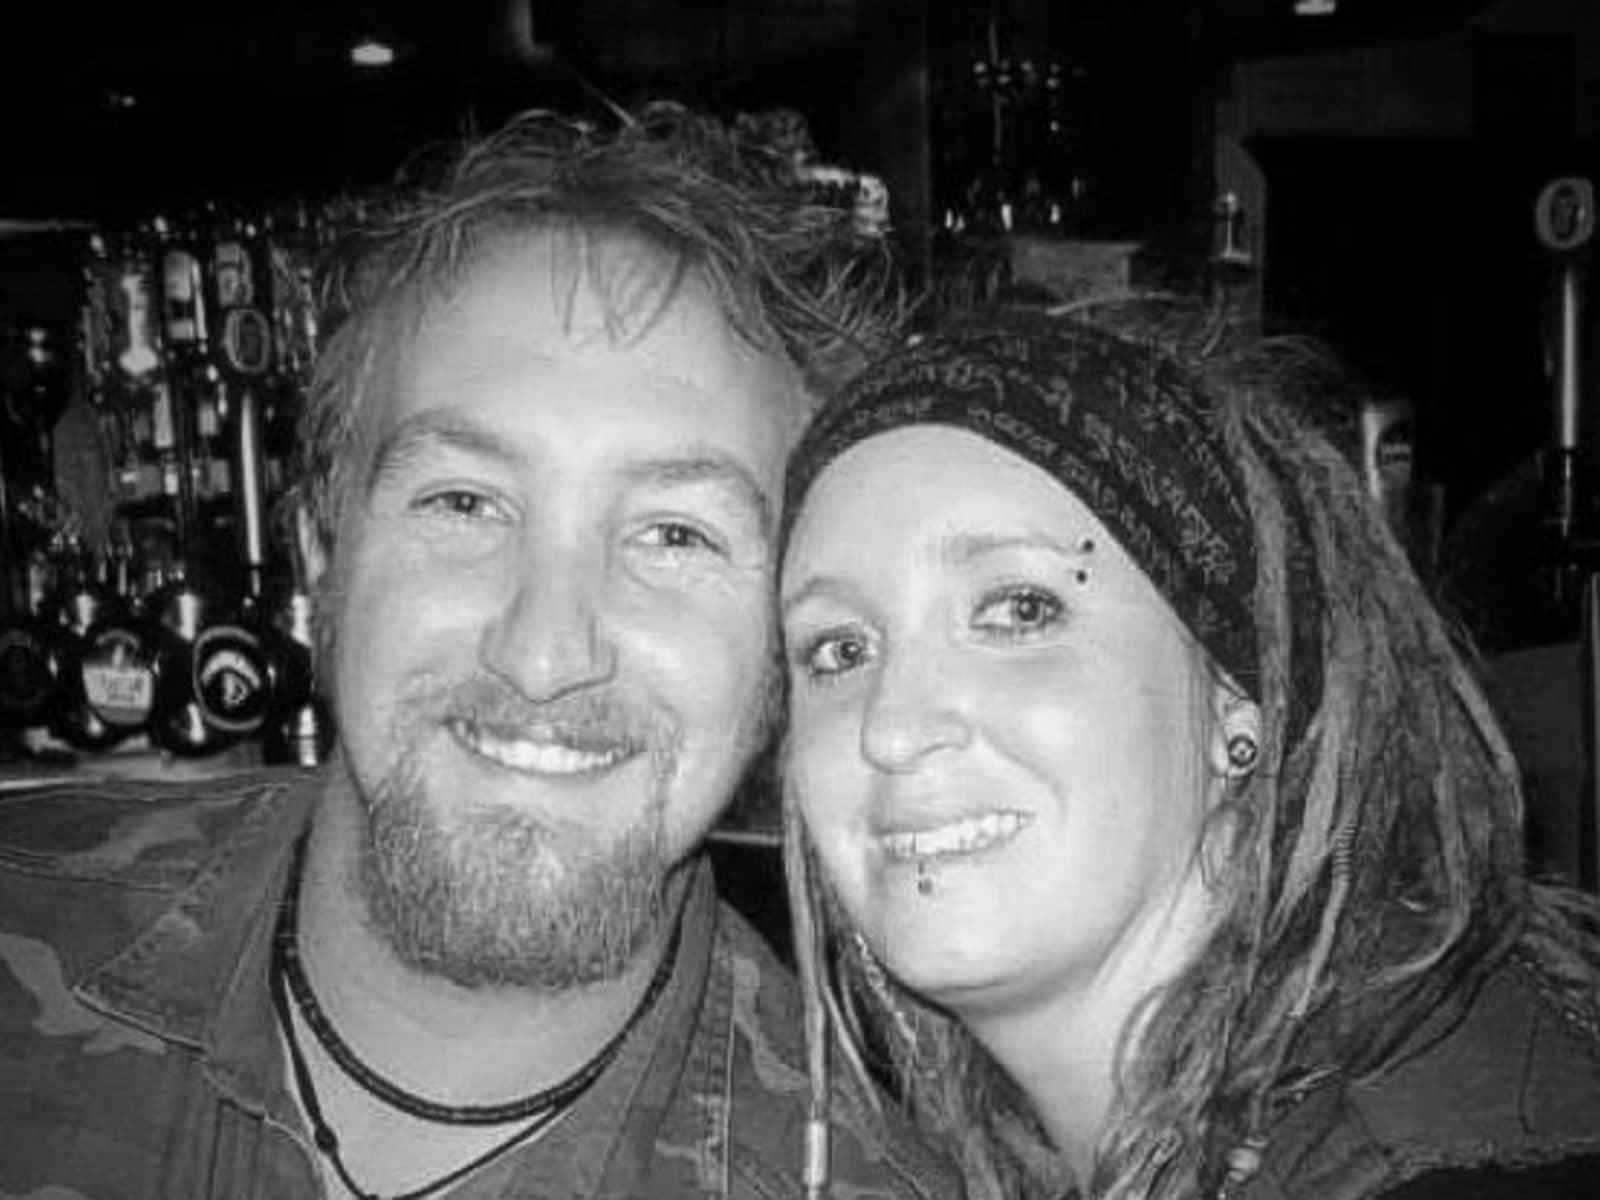 Pauline & William from Perth, Western Australia, Australia